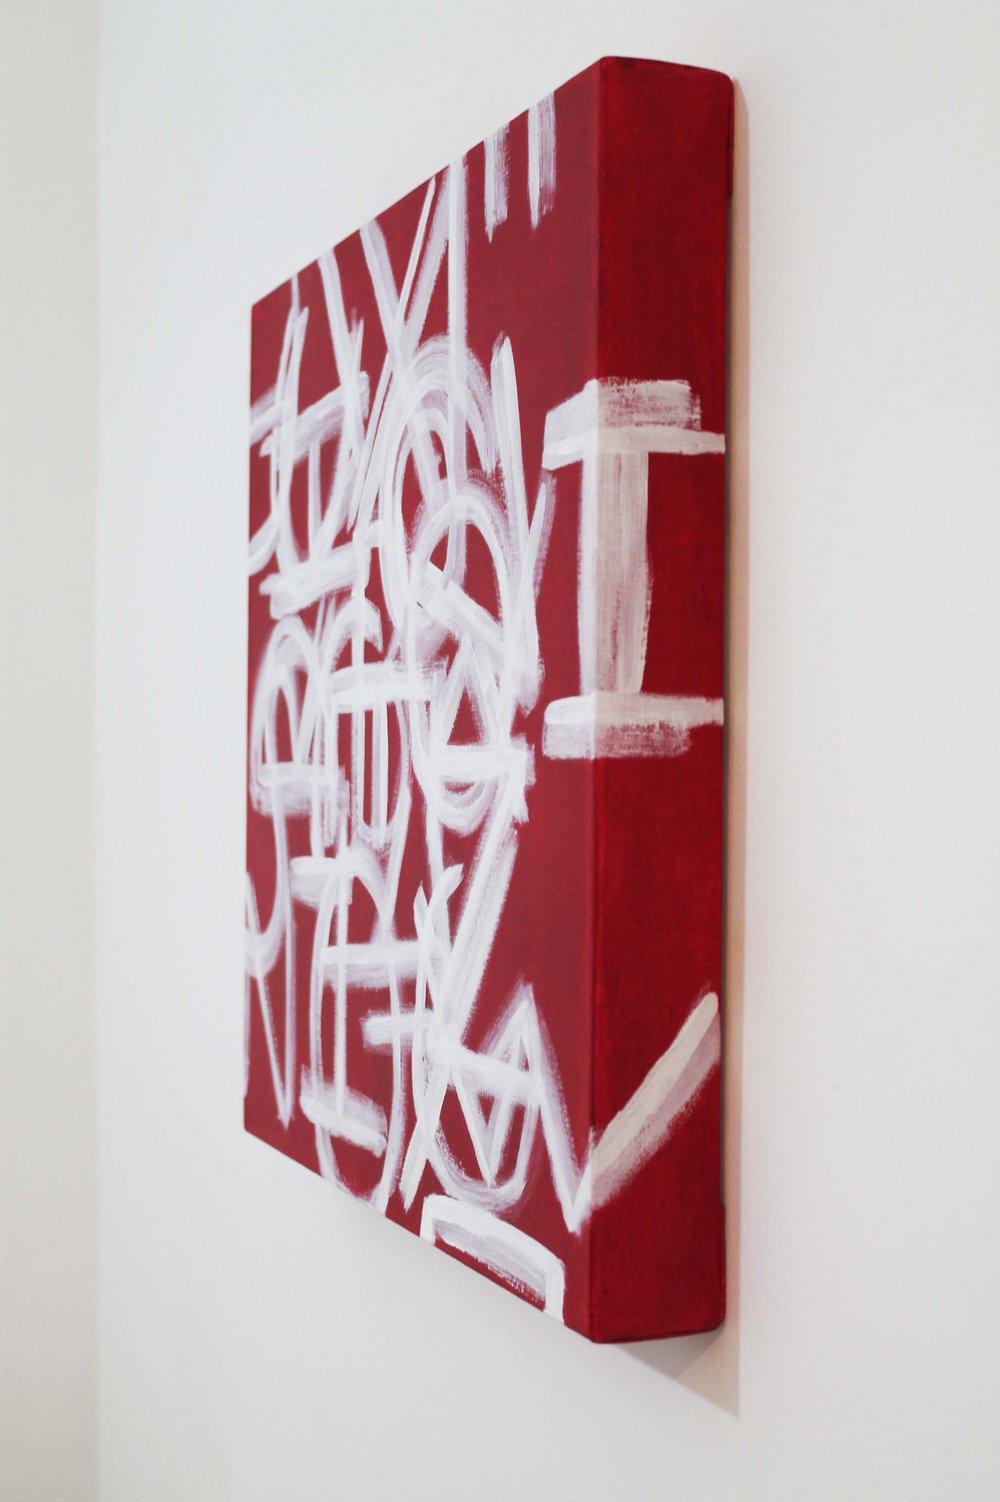 A to Z 2.0,  Acrylic on canvas, 45 x 45 x 5.5cm, 2017